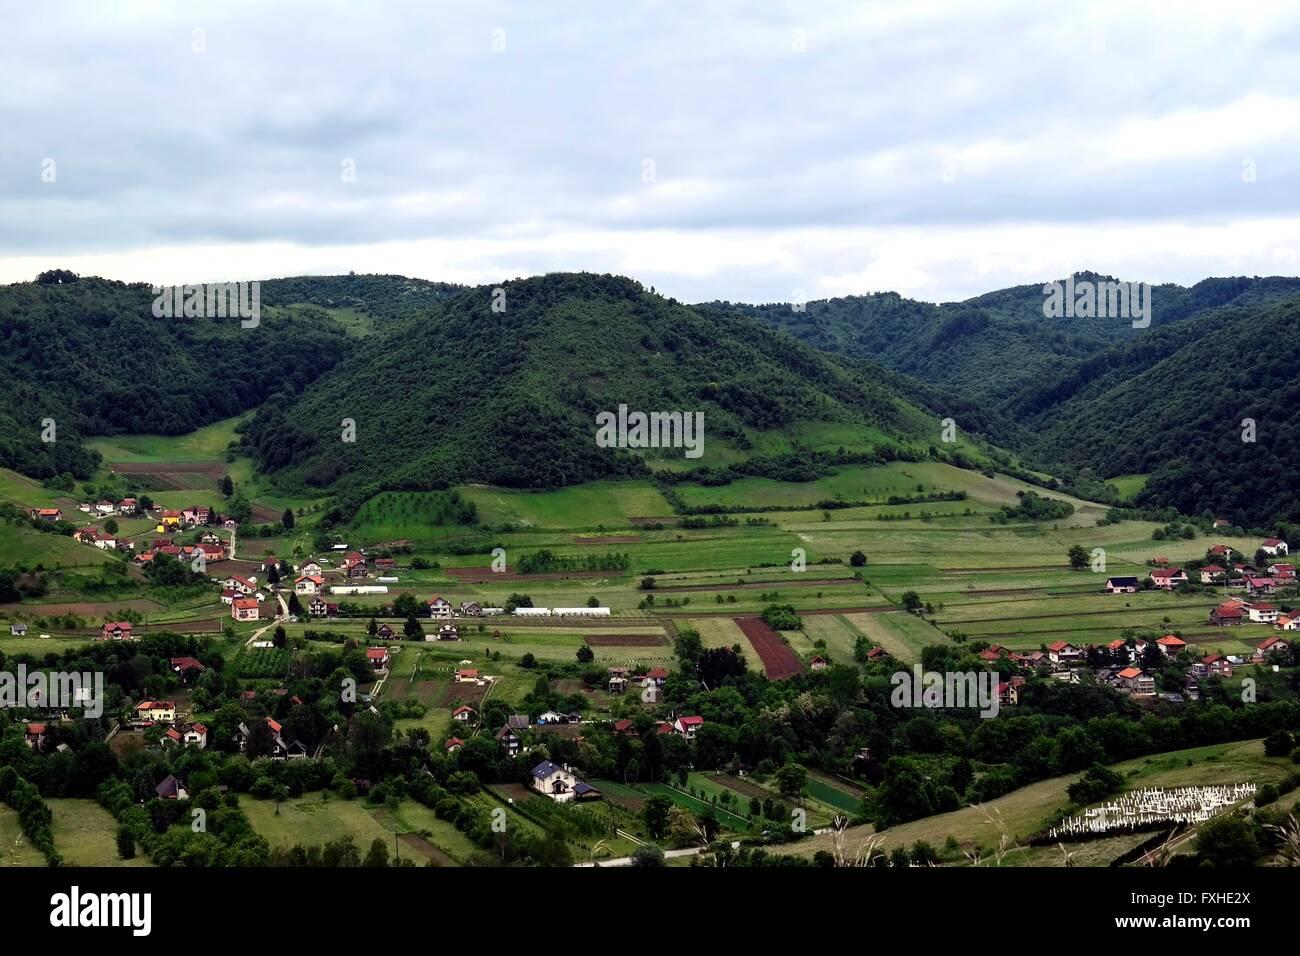 'Pyramide of the moon' in Visoko, Bosnia - Stock Image